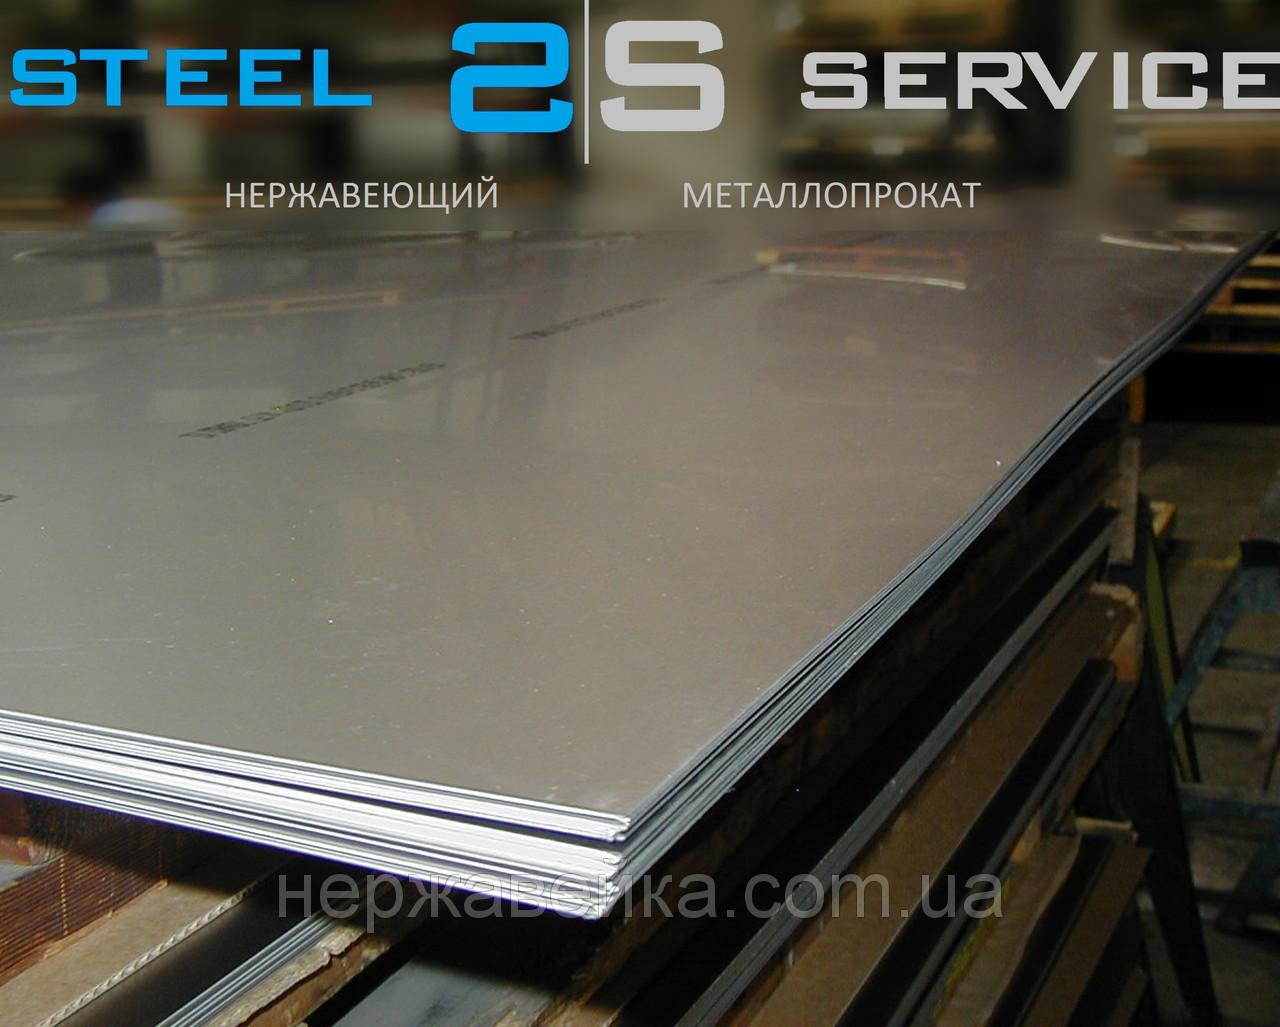 Нержавейка лист 8х1000х2000мм  AISI 316Ti(10Х17Н13М2Т) F1 - горячекатанный,  кислотостойкий